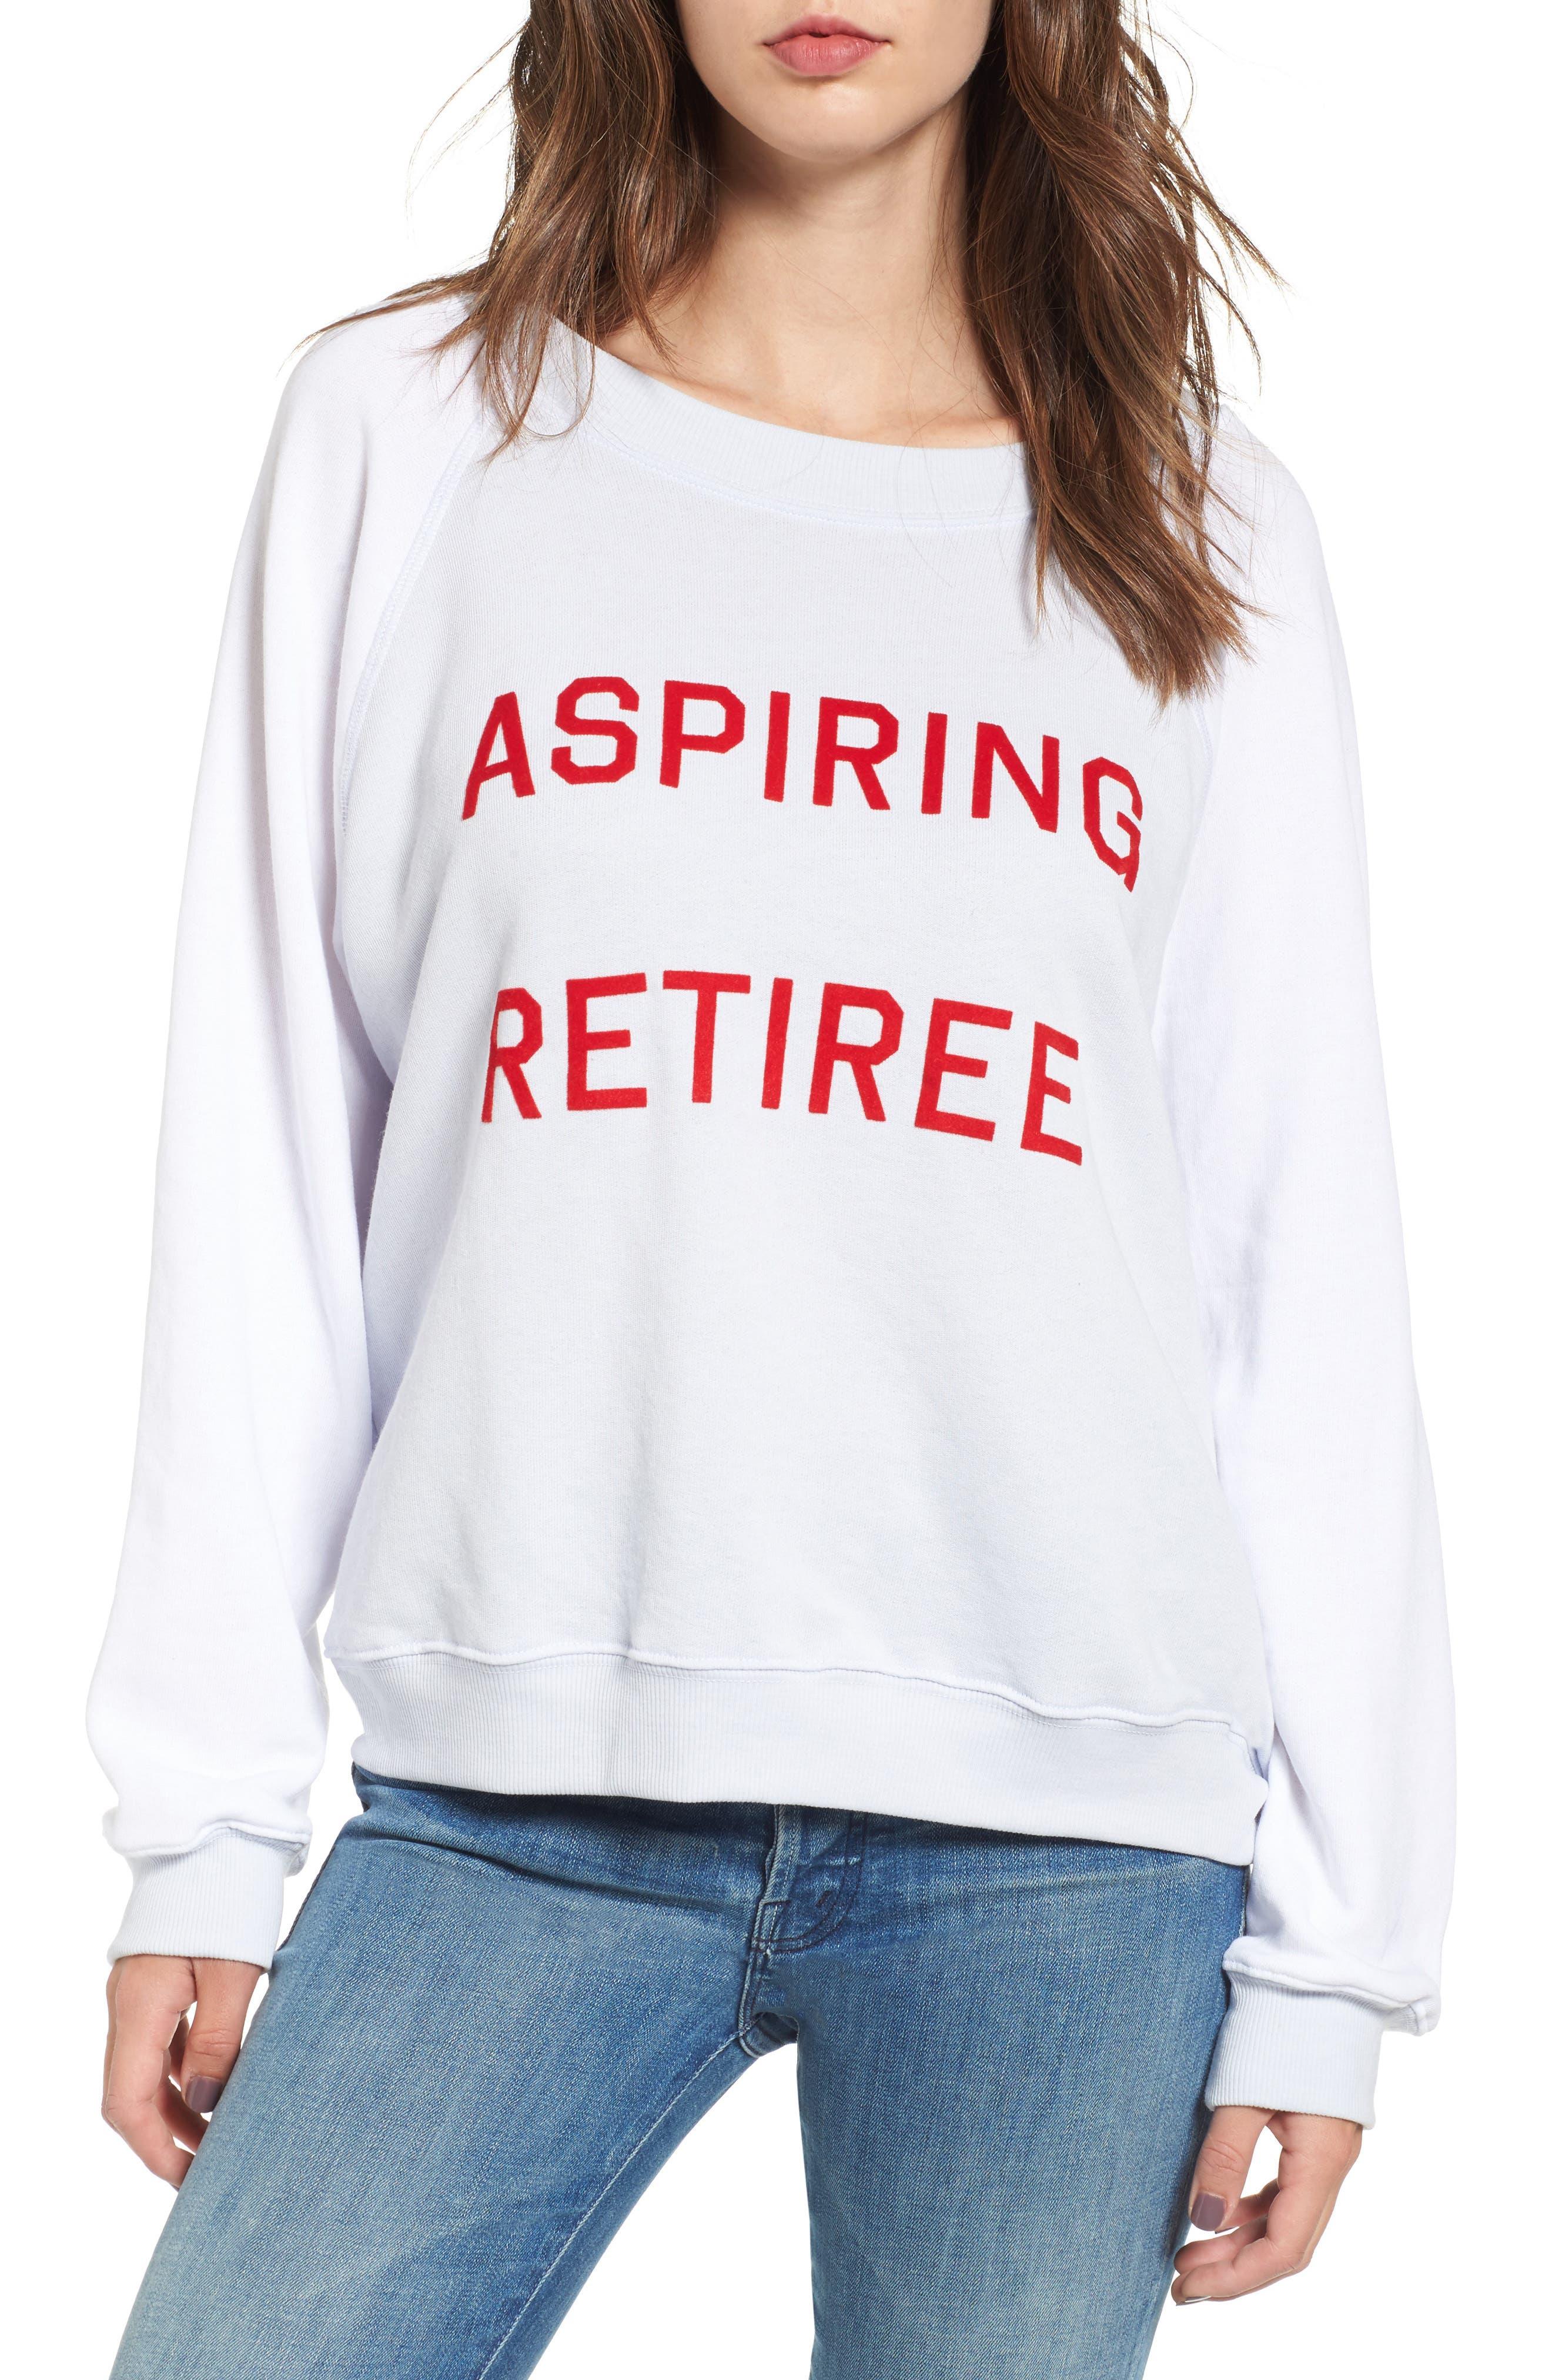 Aspiring Retiree Sweatshirt,                             Main thumbnail 1, color,                             Blue Pearl